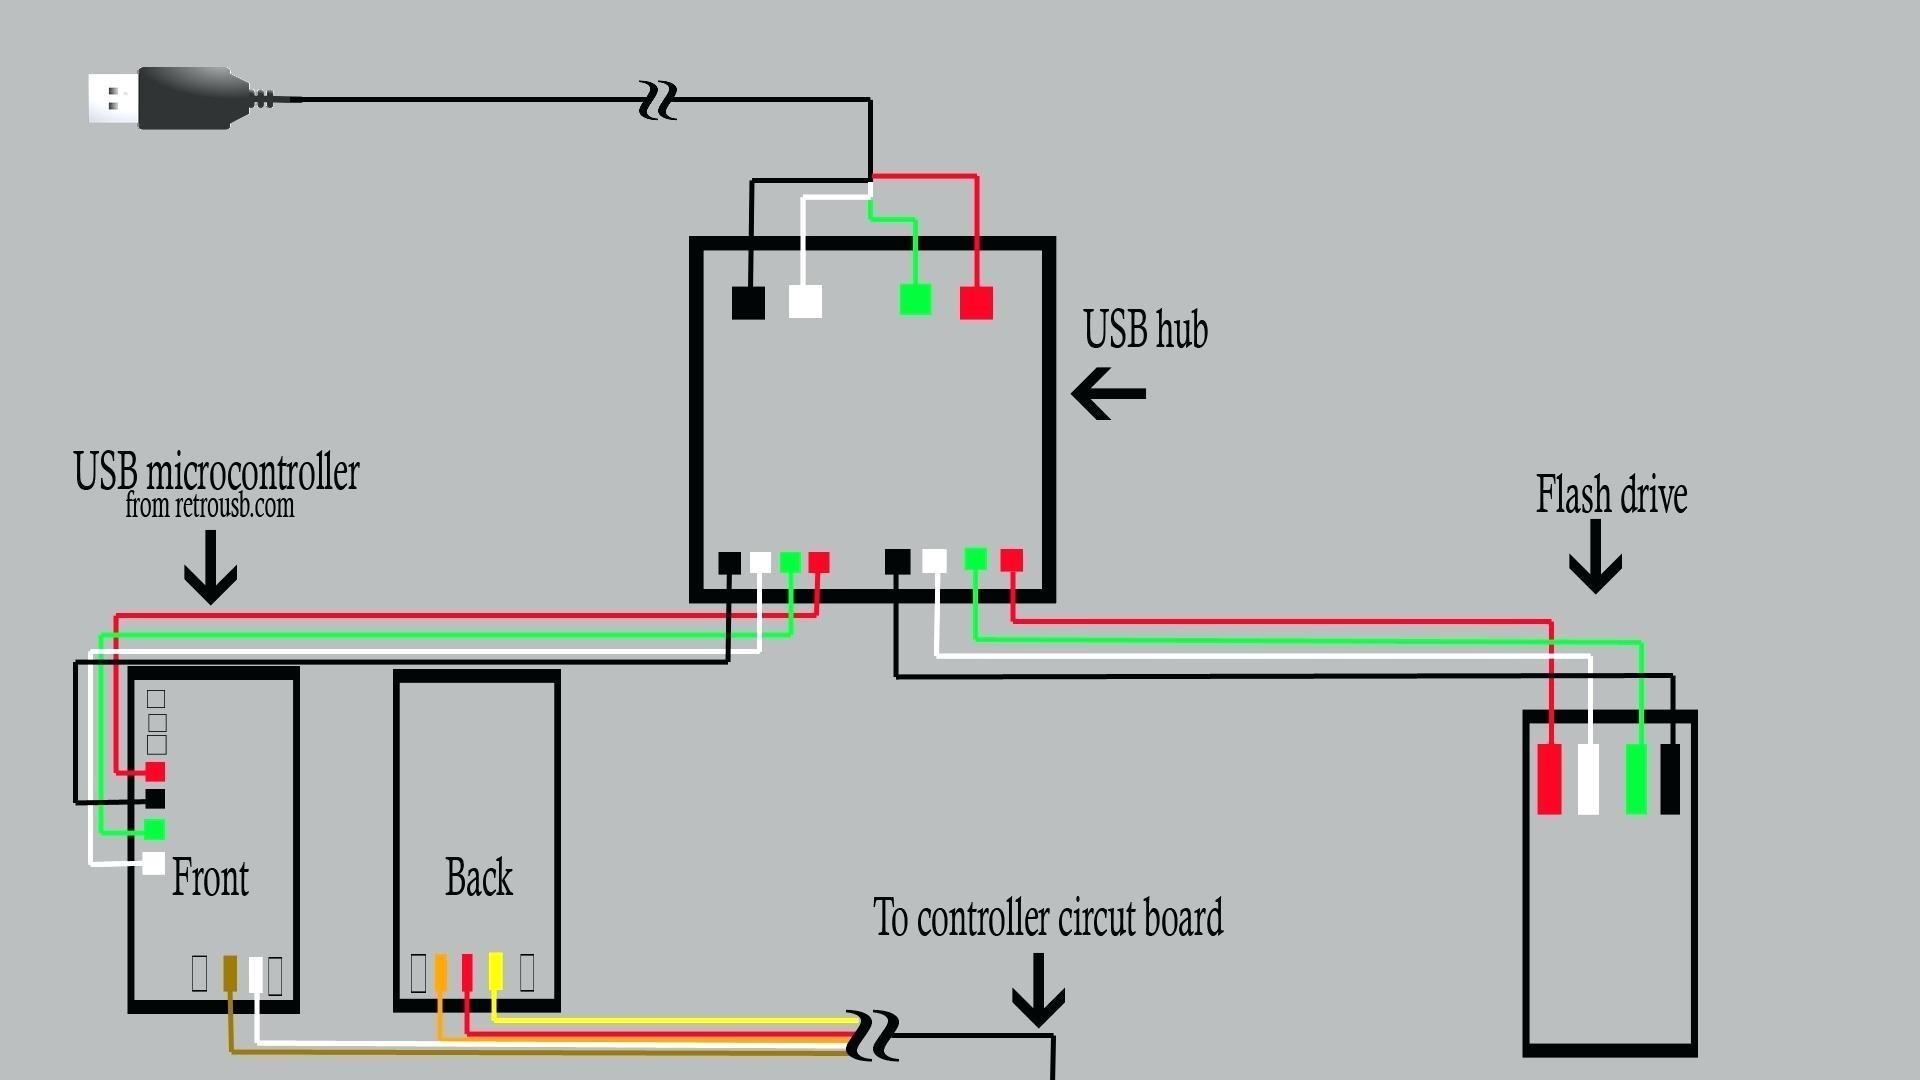 Rca Cable Diagram Wiring Diagram Rows Cable Rca Diagrama